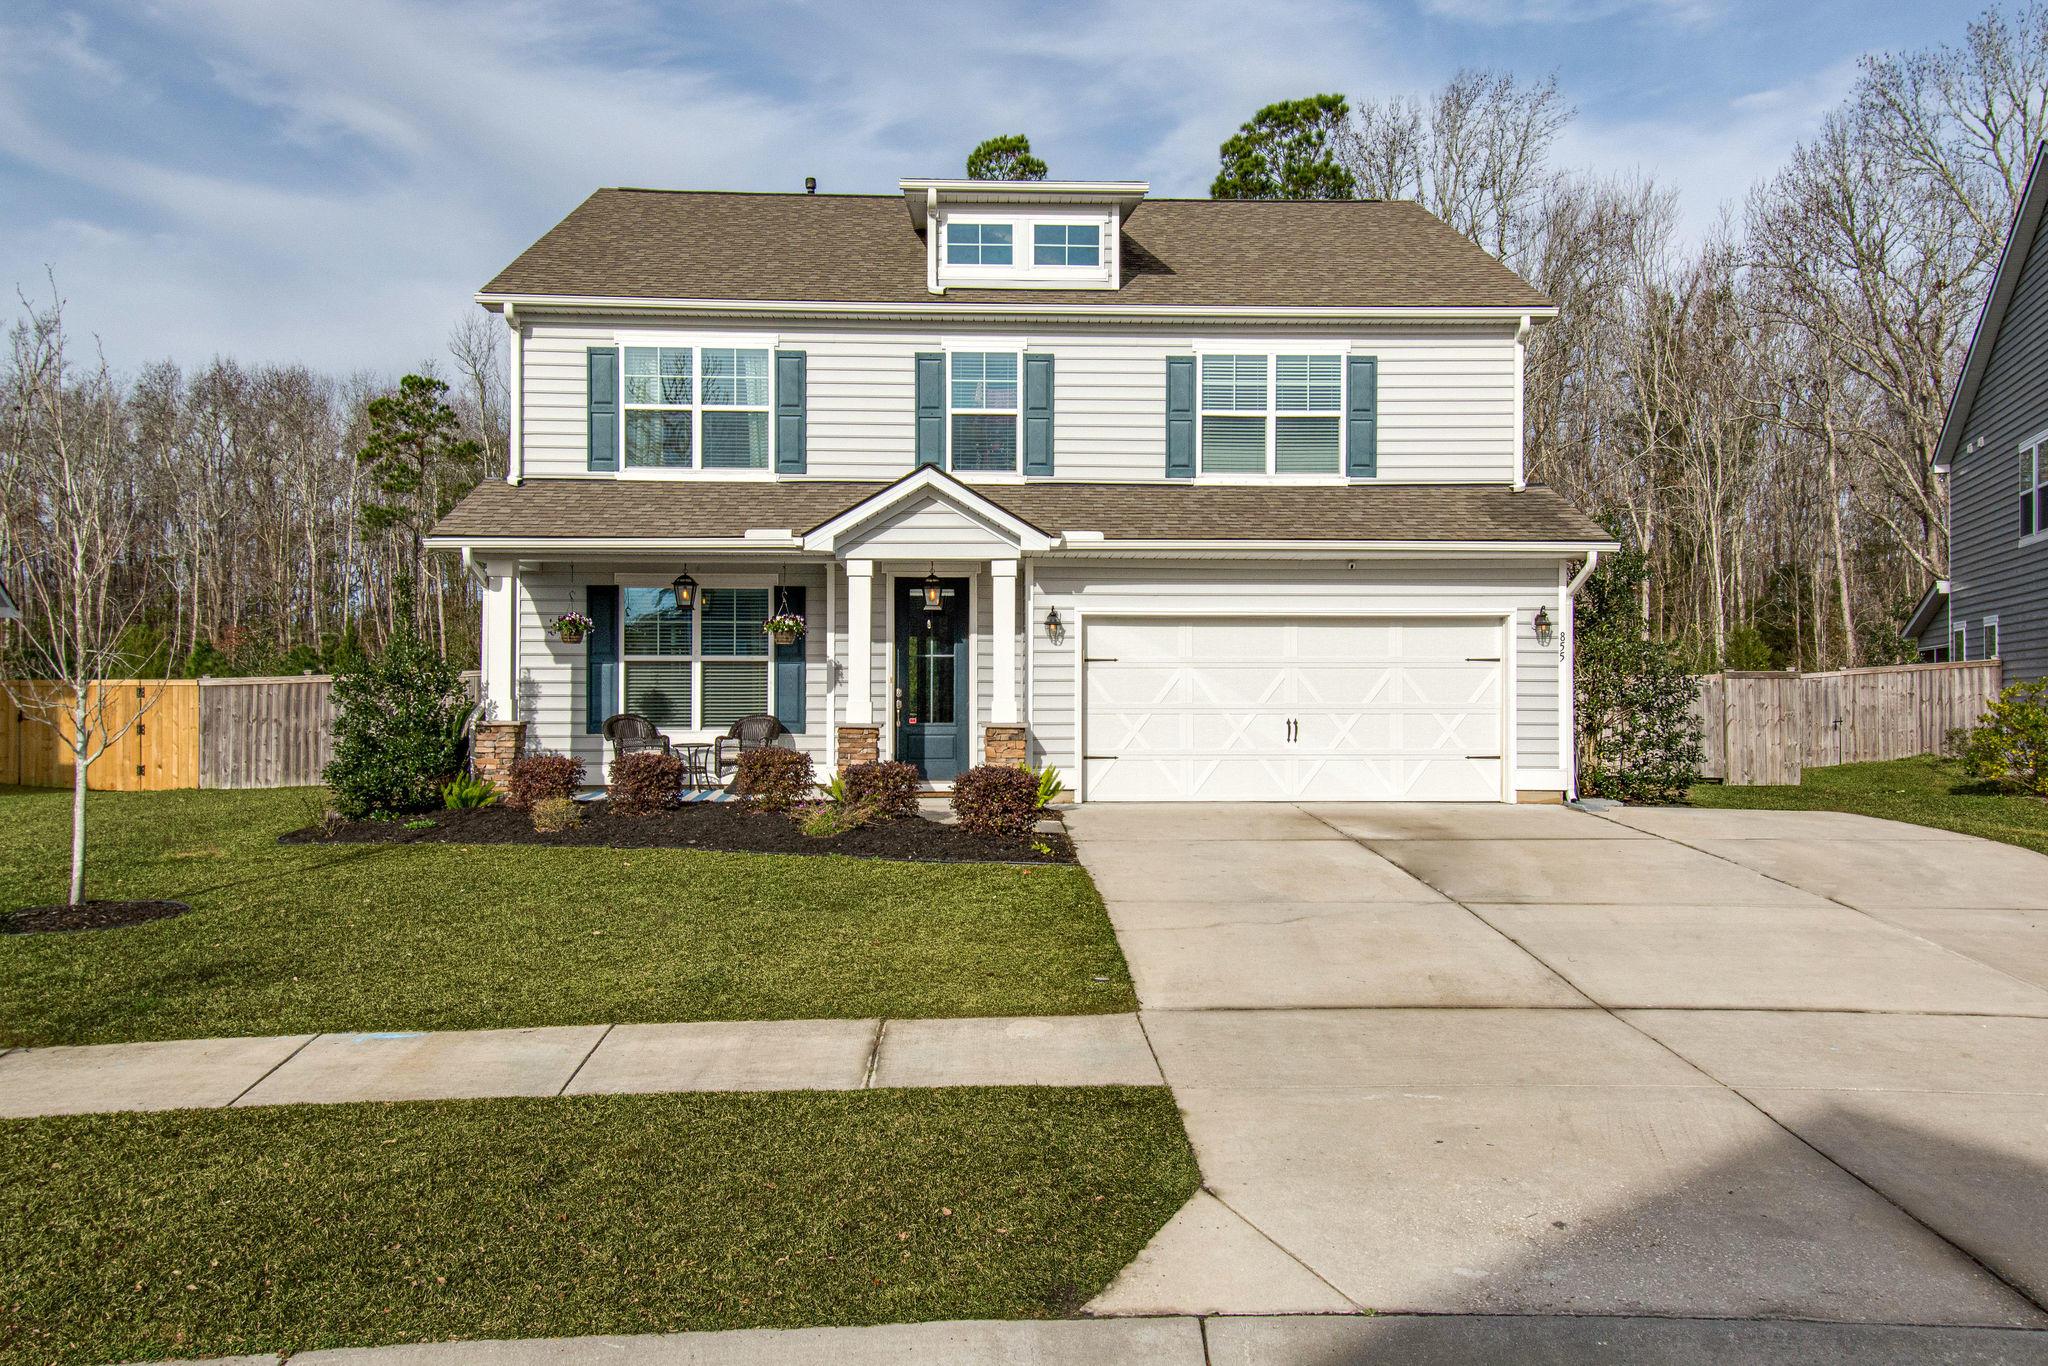 Harbor Woods Homes For Sale - 855 Harbor Woods, Charleston, SC - 0